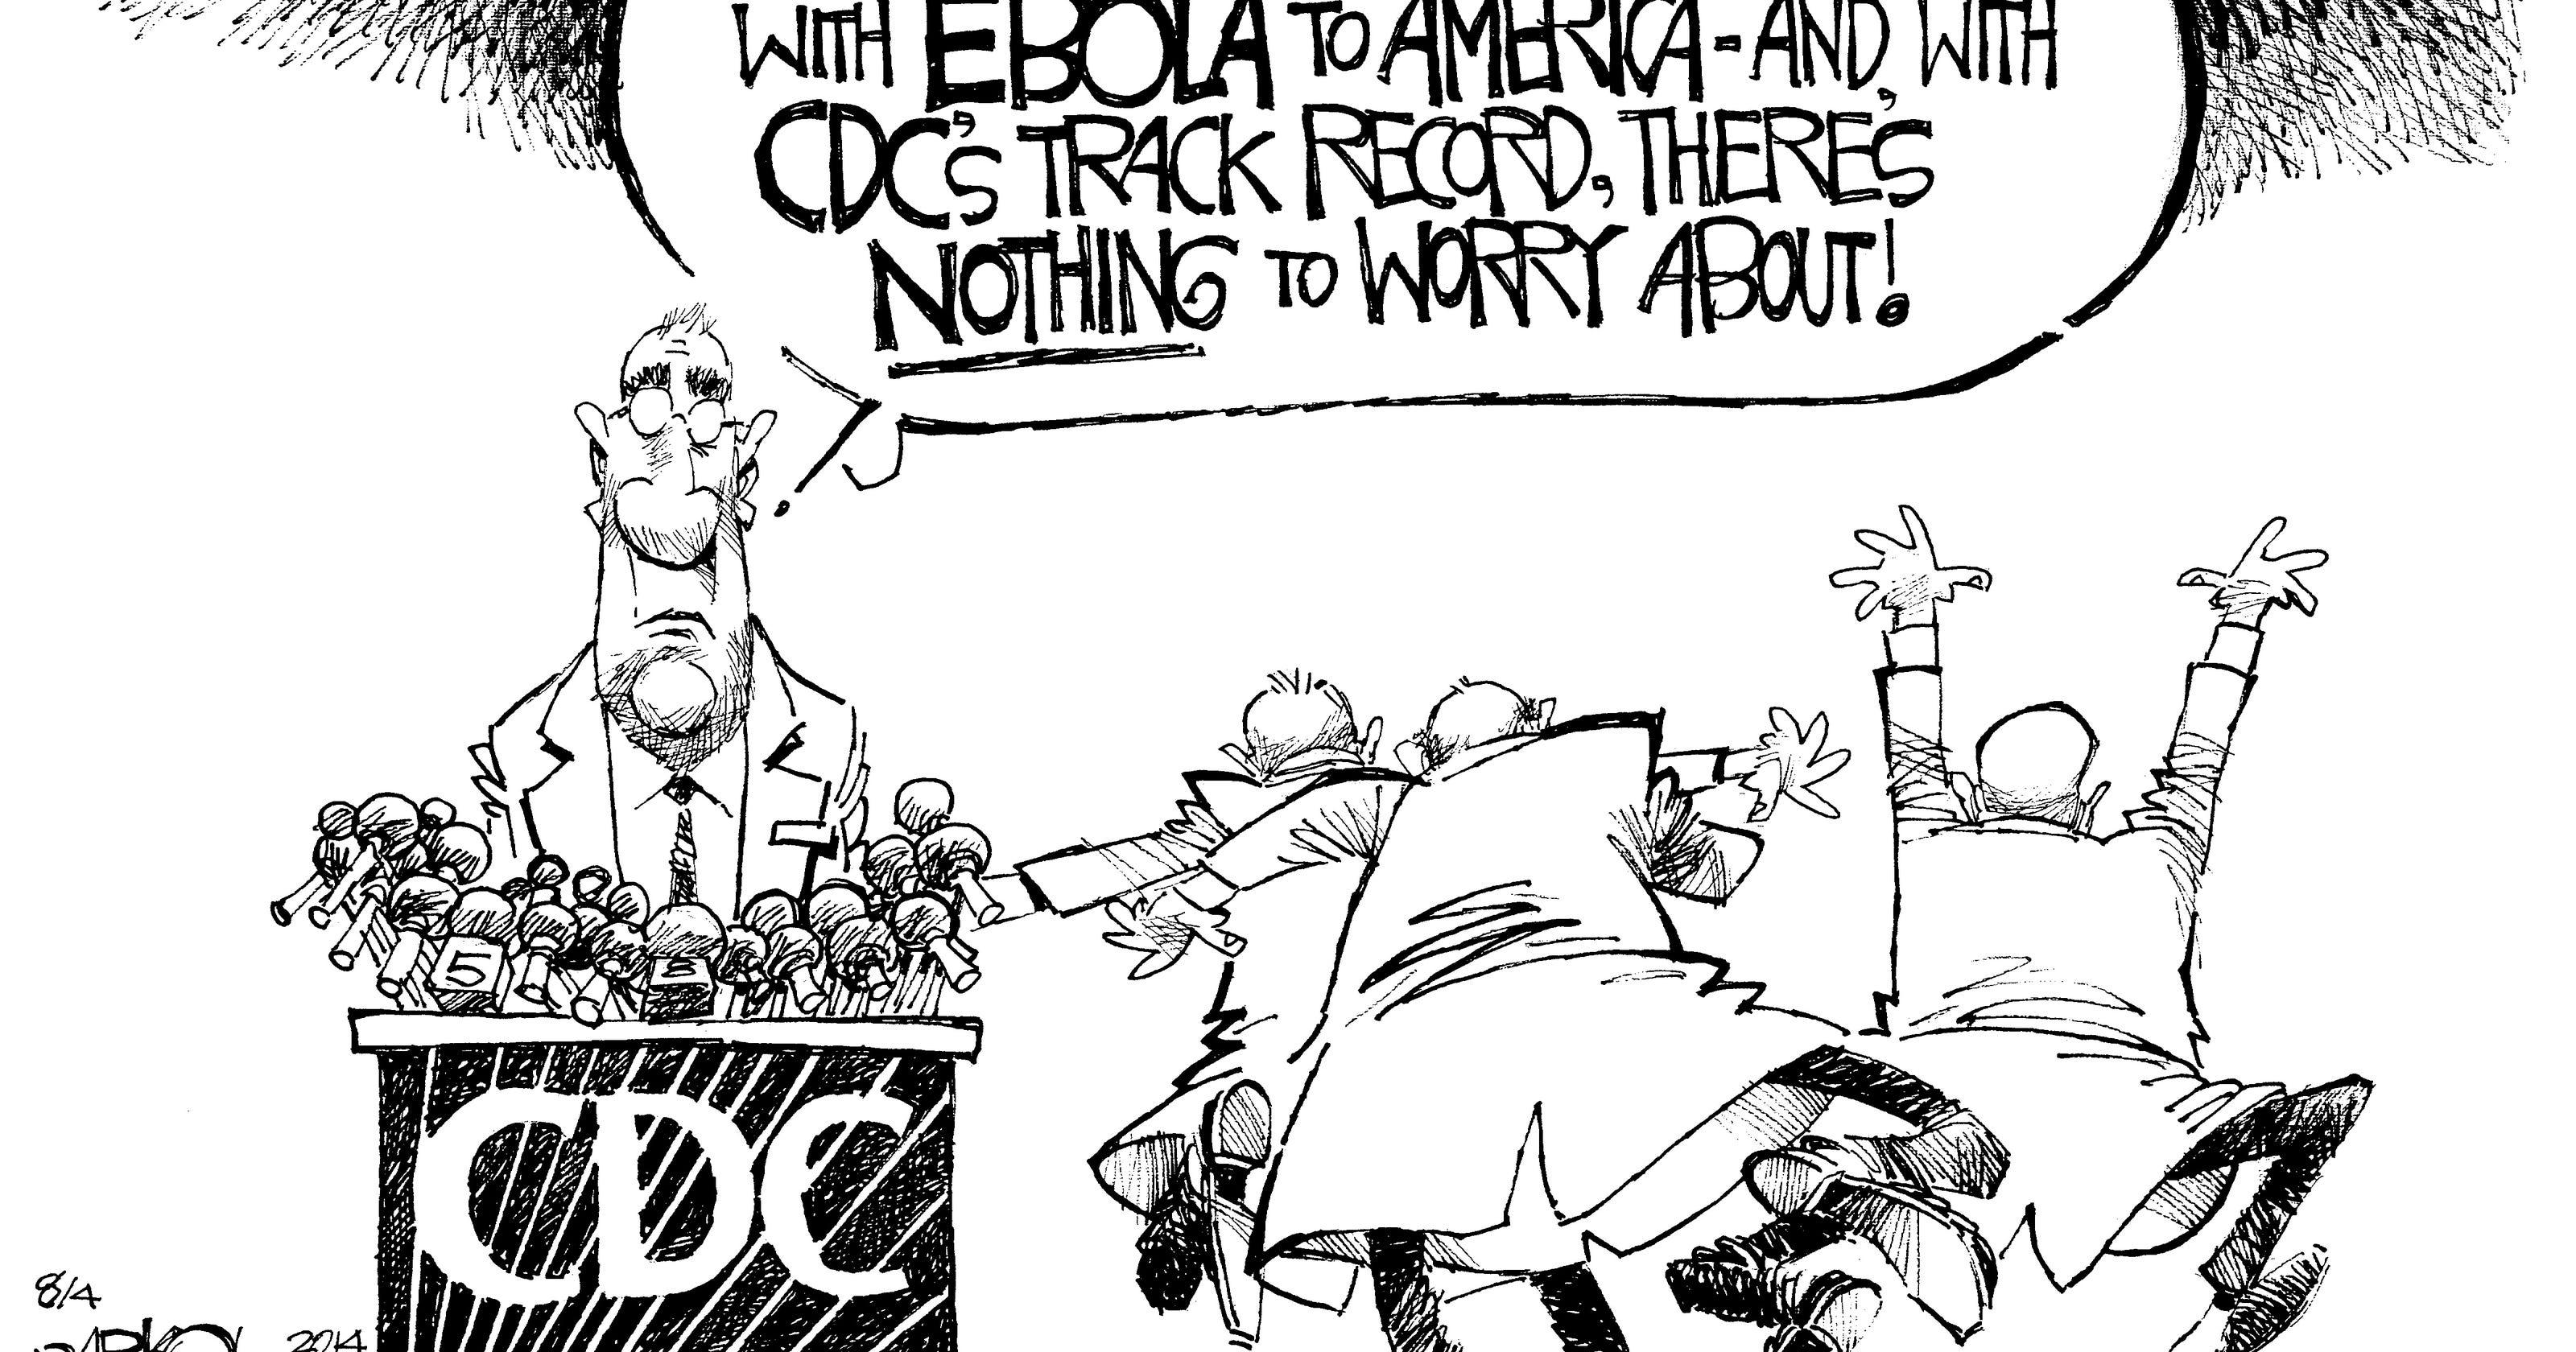 CARTOON: Ebola and the CDC